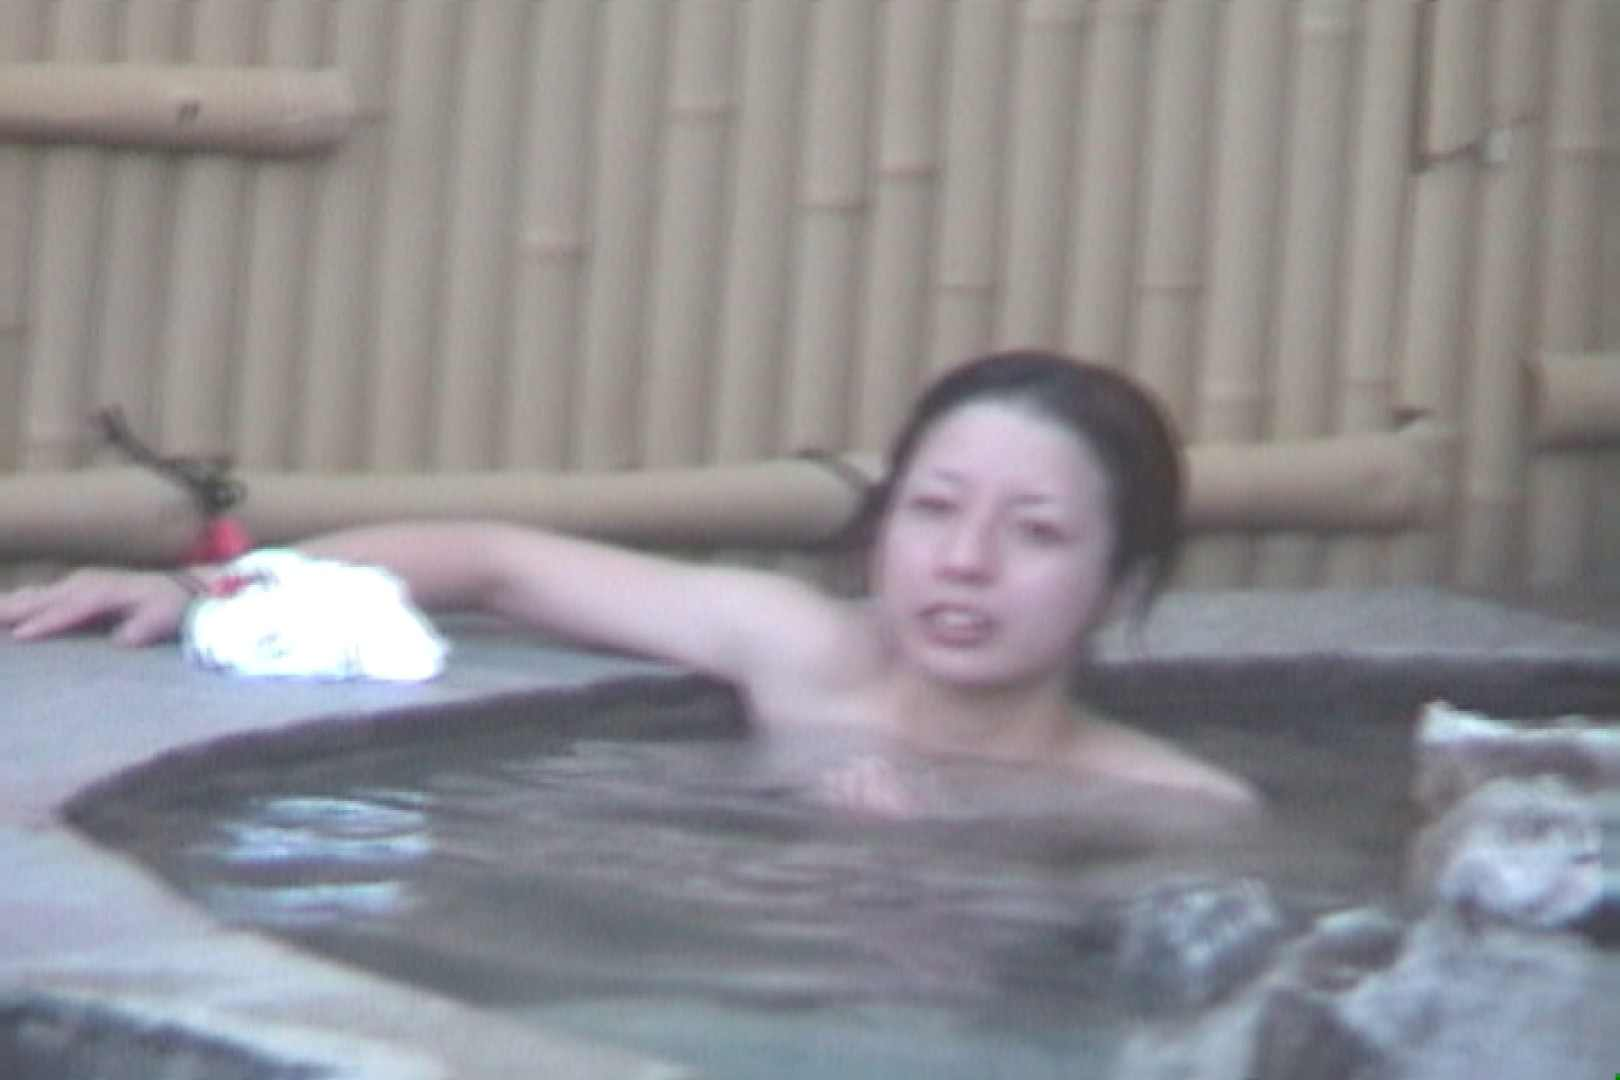 Aquaな露天風呂Vol.608 HなOL | 盗撮  89pic 10